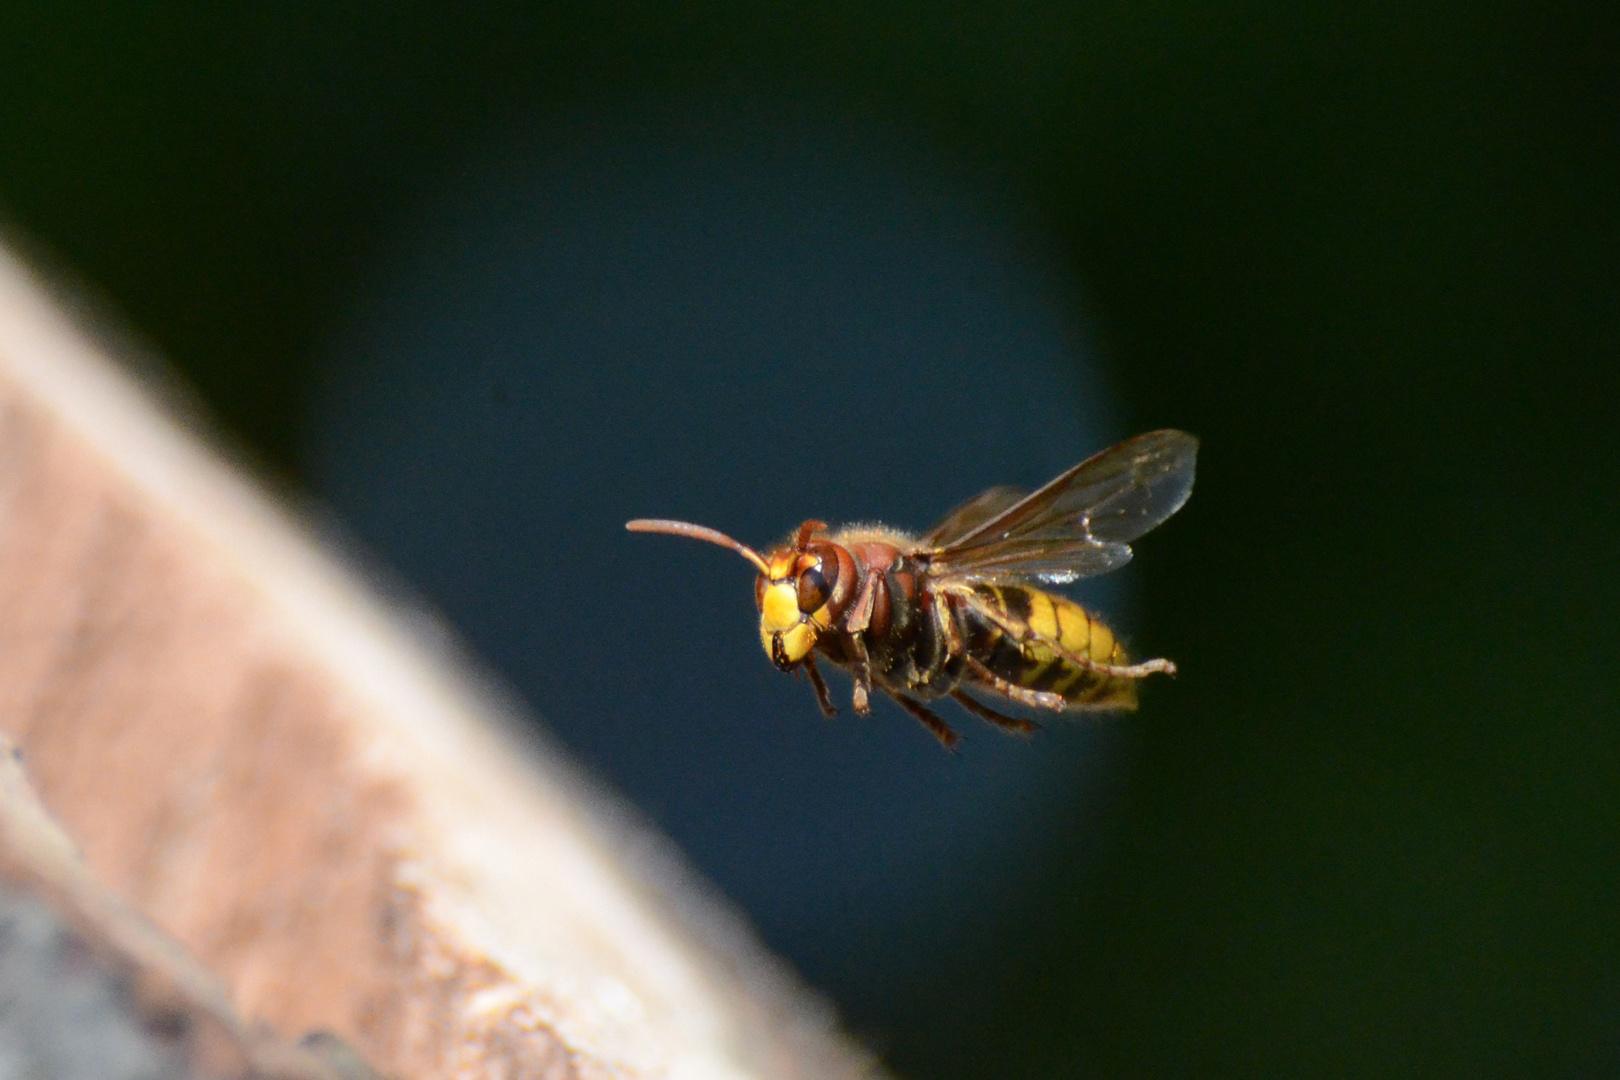 Hornet - Air